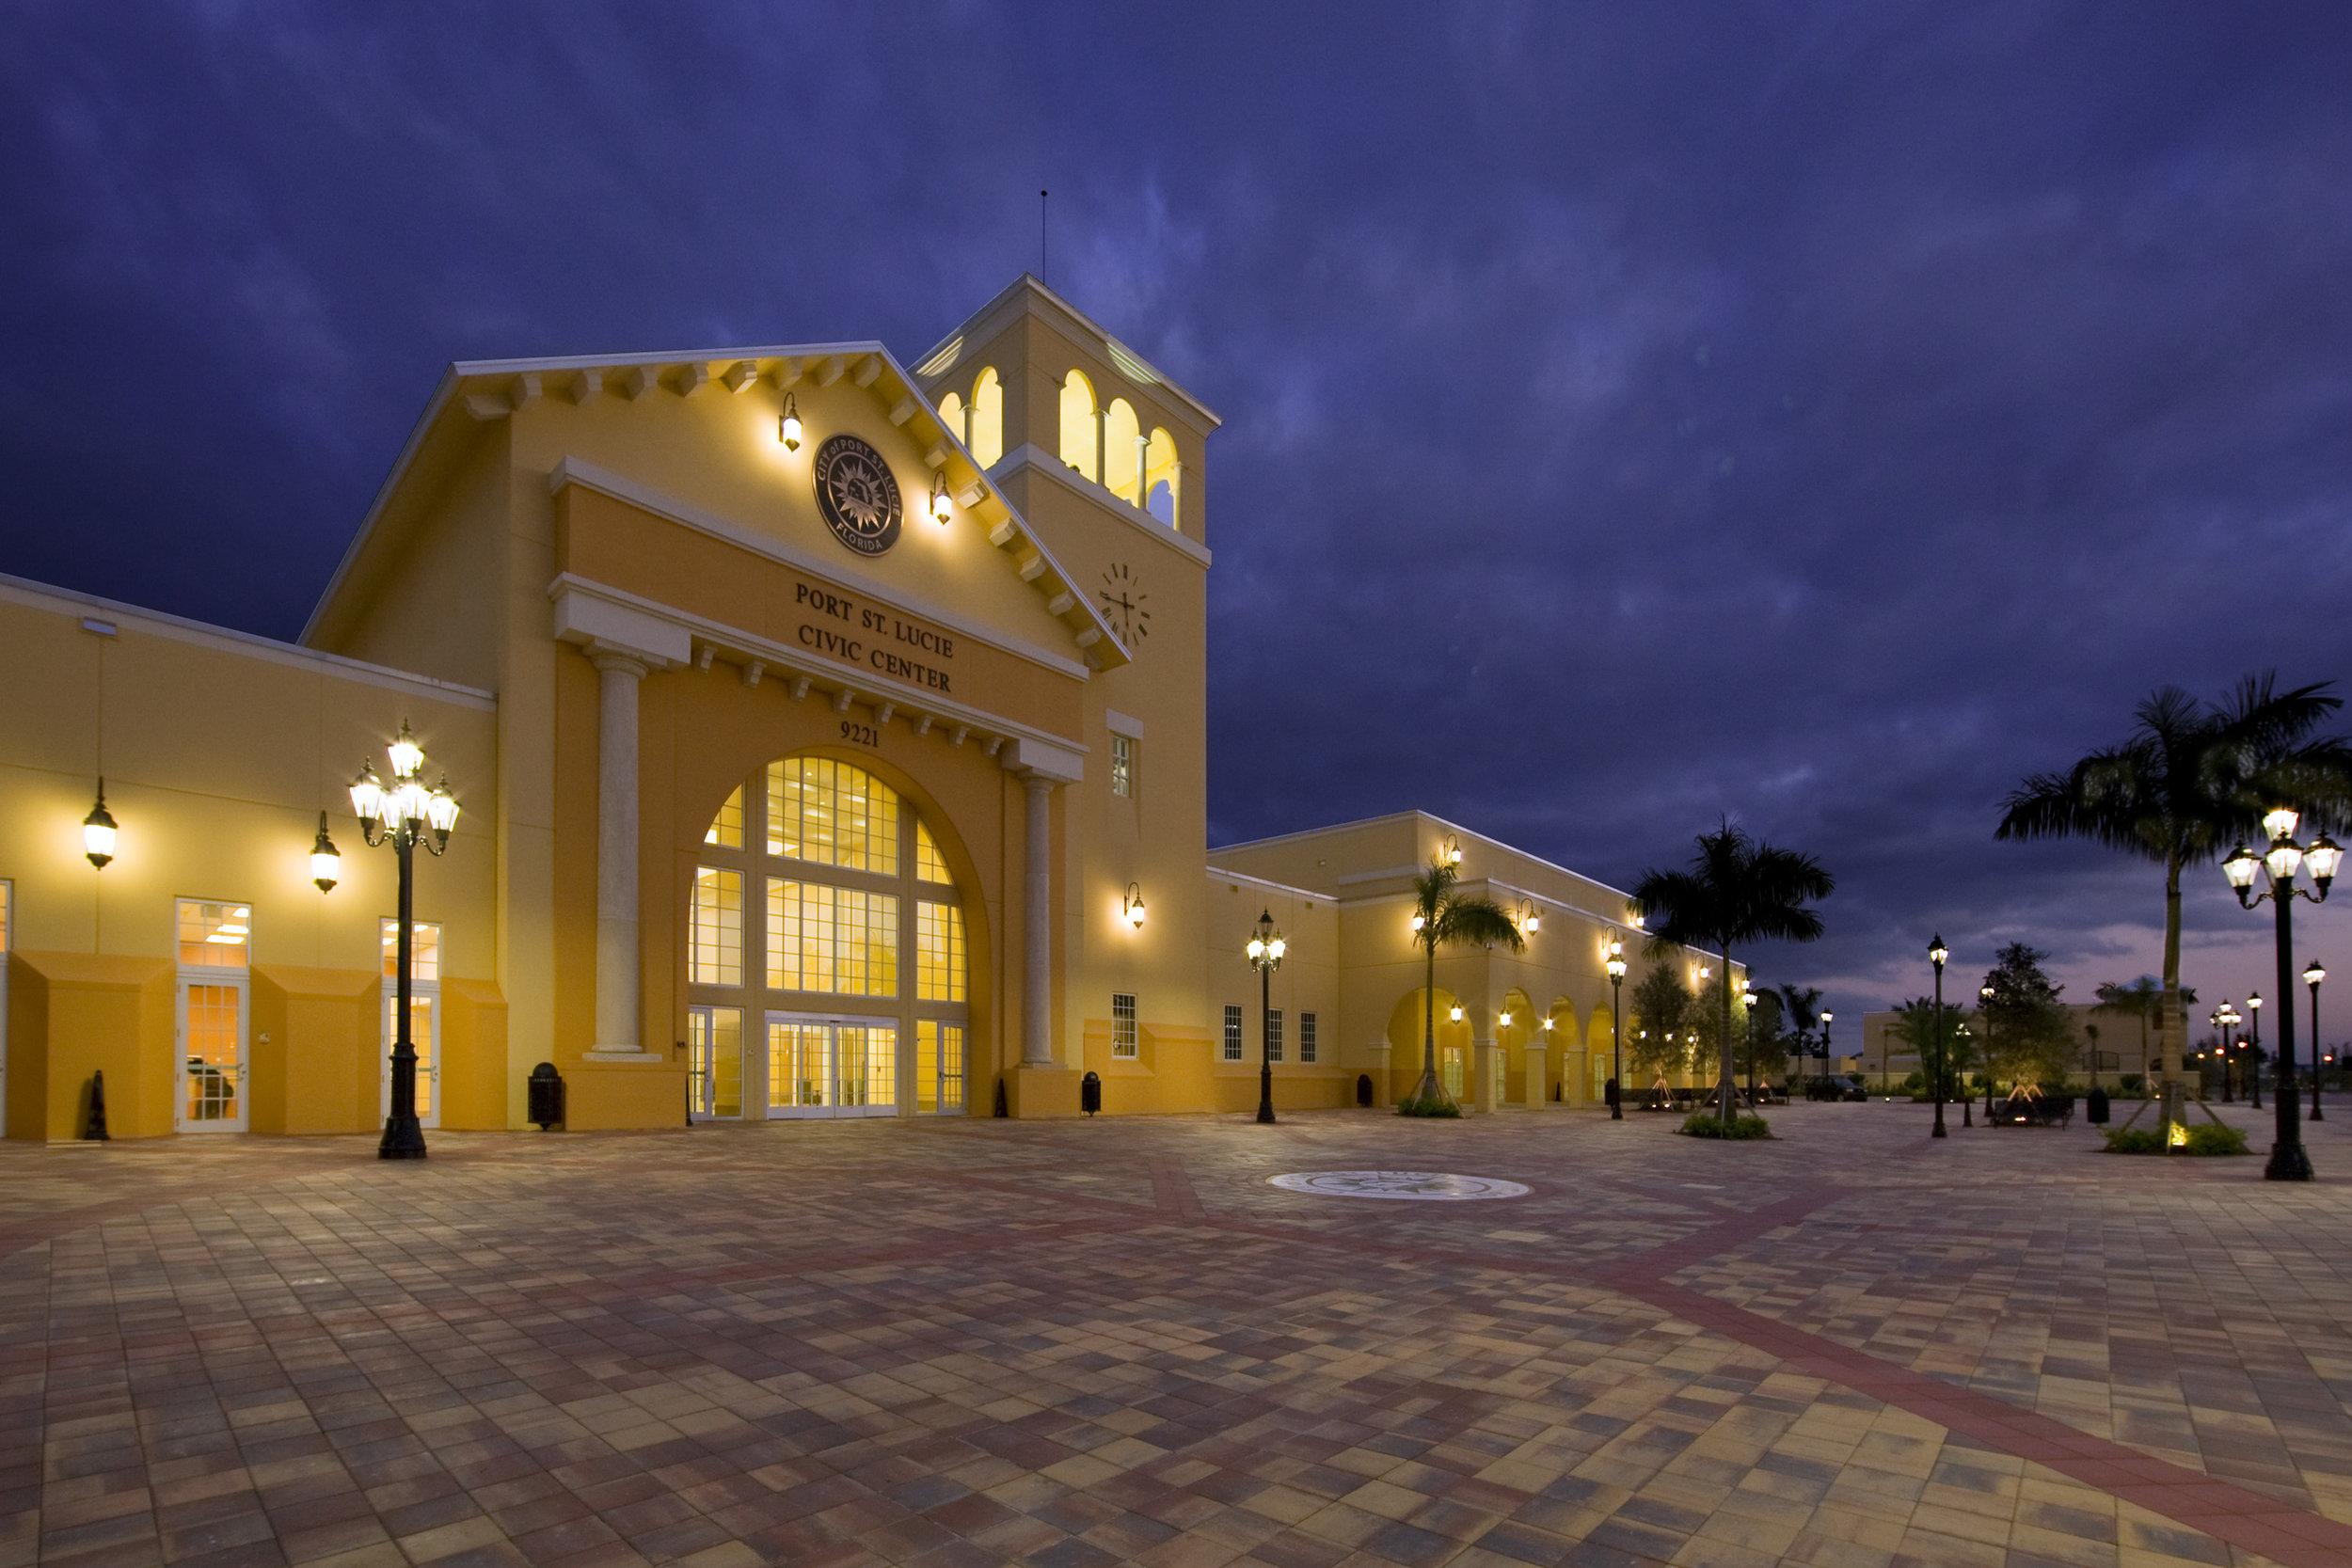 Port St. Lucie Civic Center -